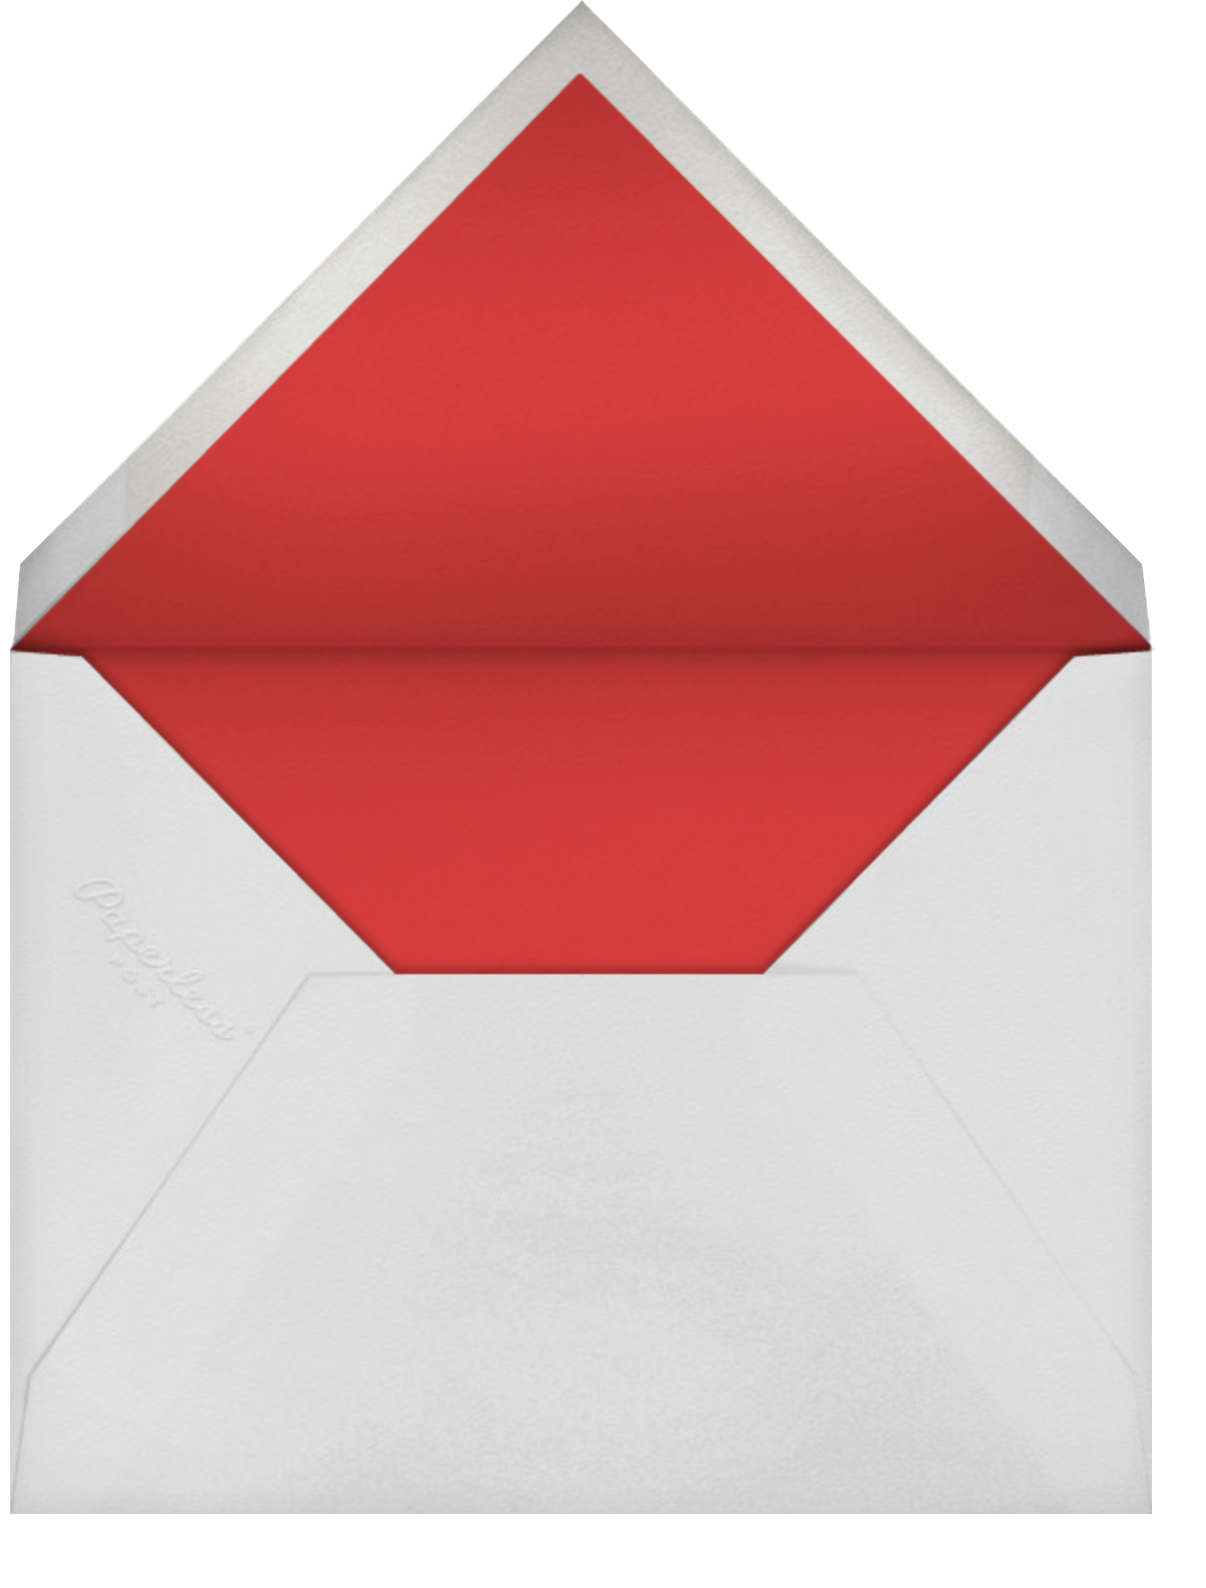 Parterre - Red and Kona - Crane & Co. - All - envelope back